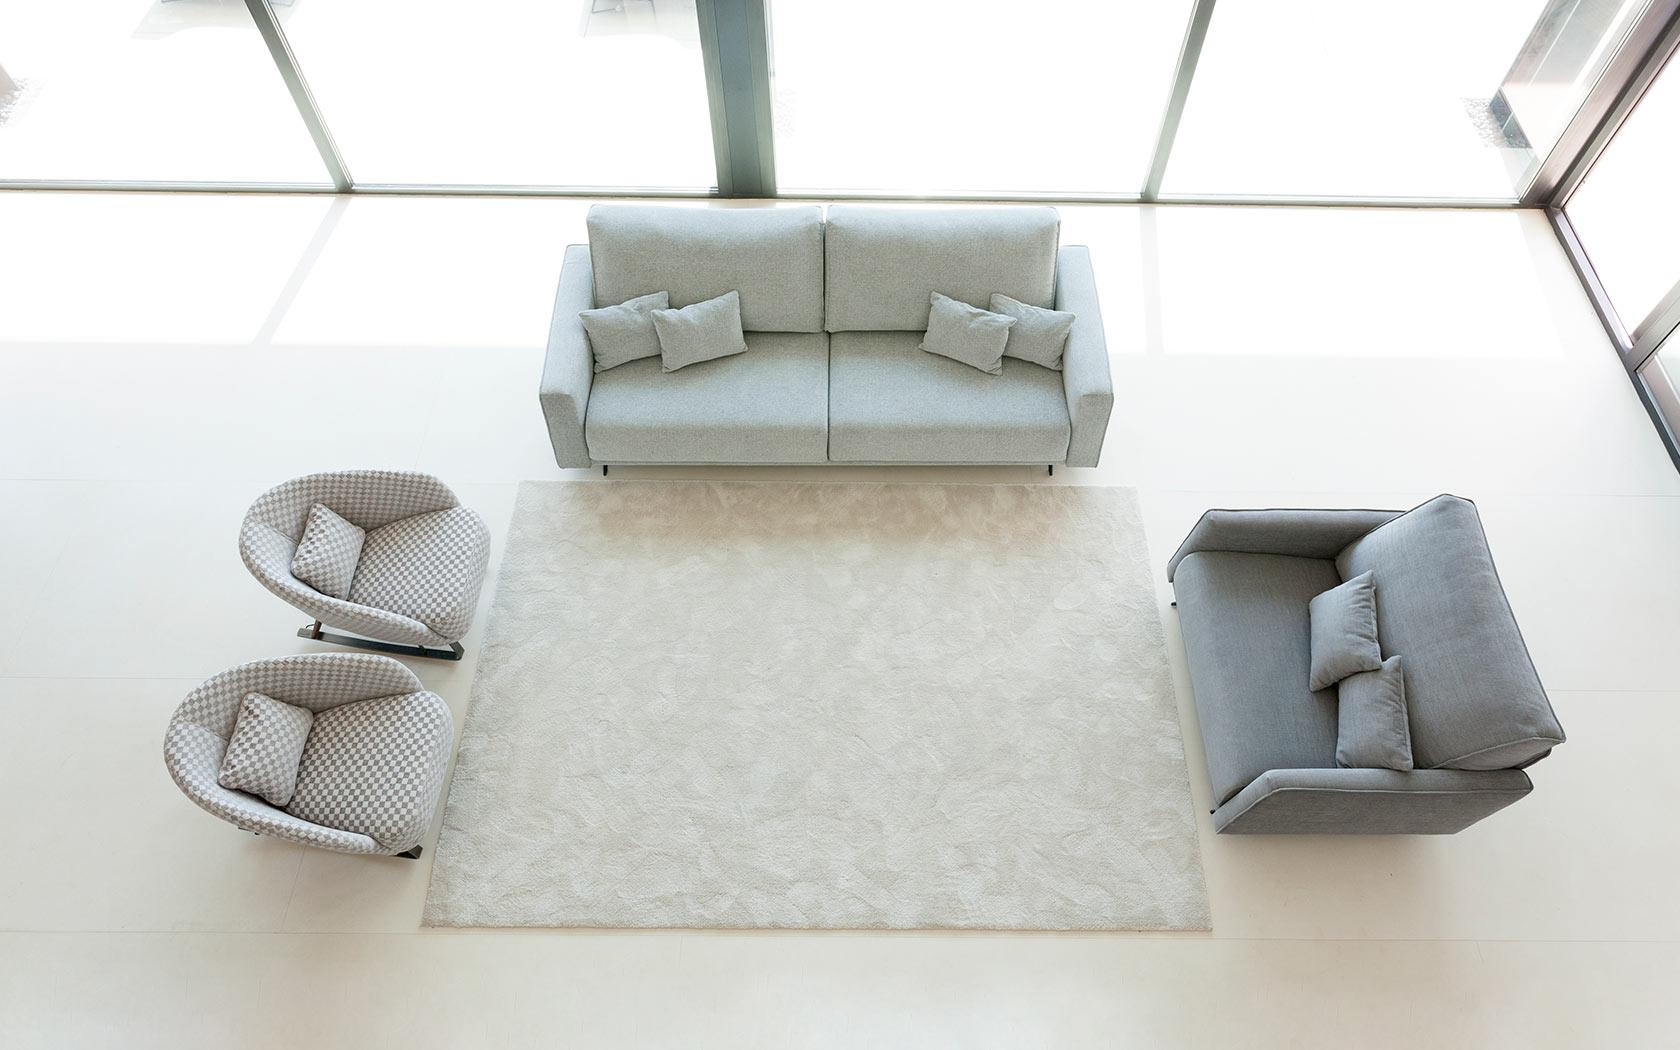 Boston sofa Fama 2019 06